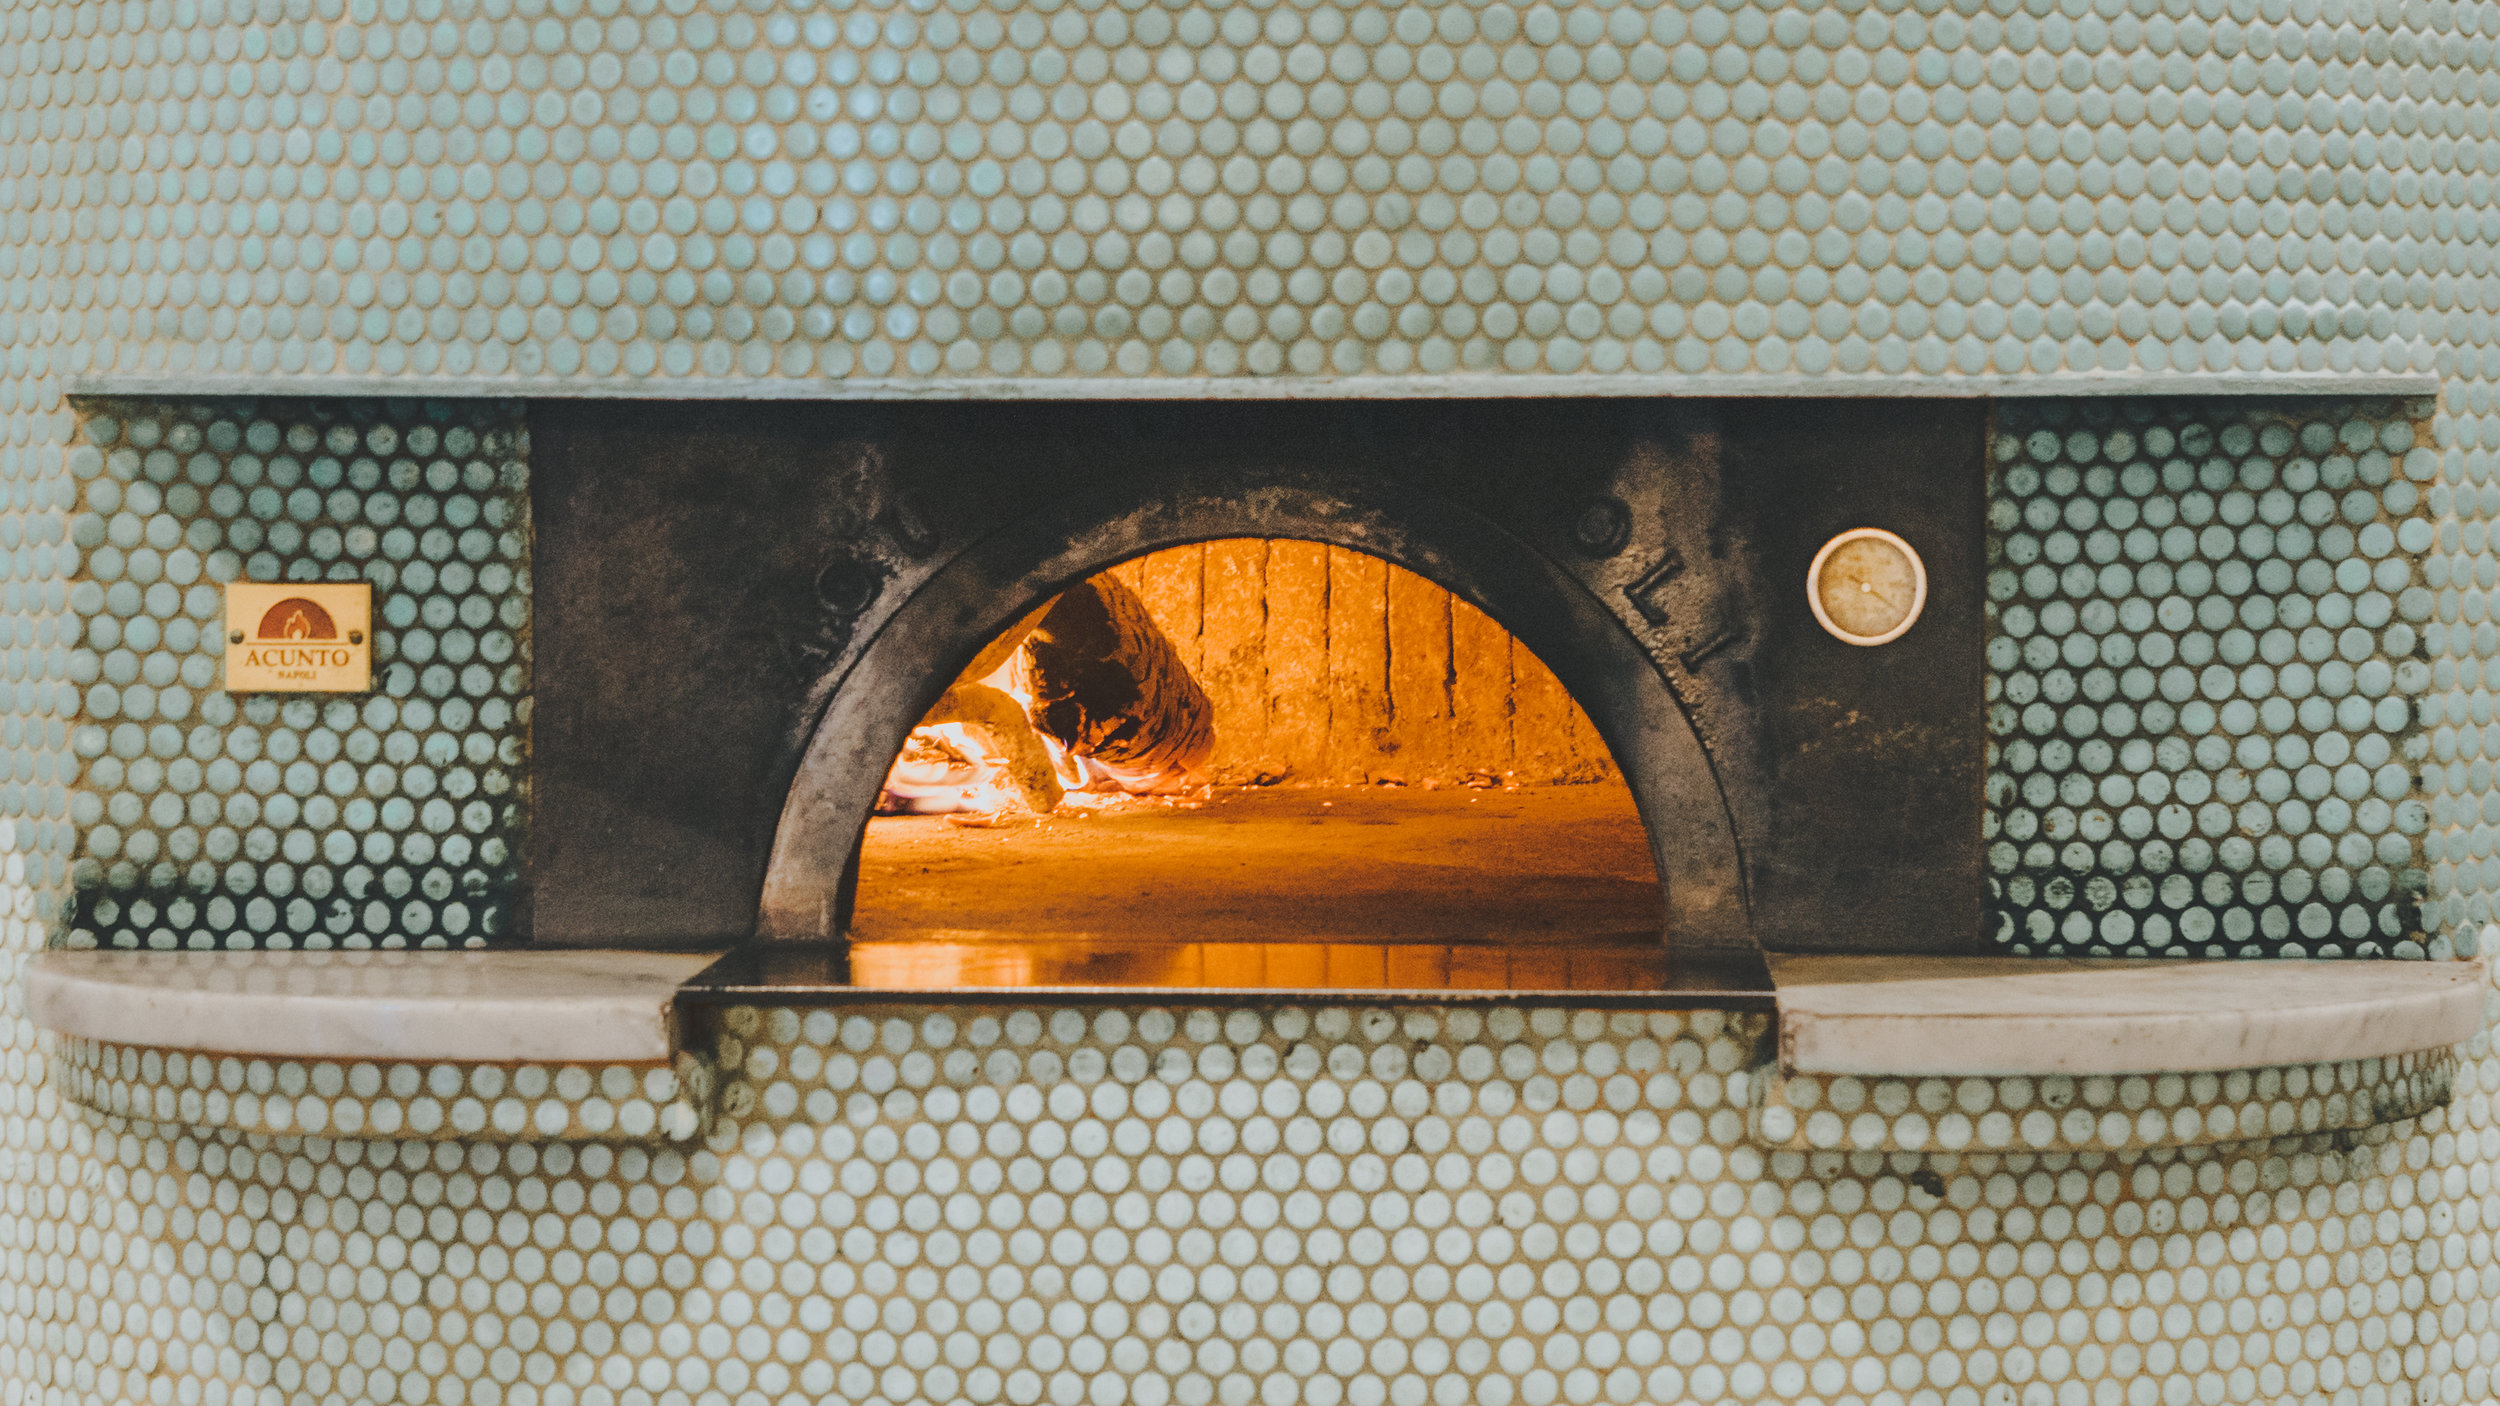 Acunto Oven  #1.jpg